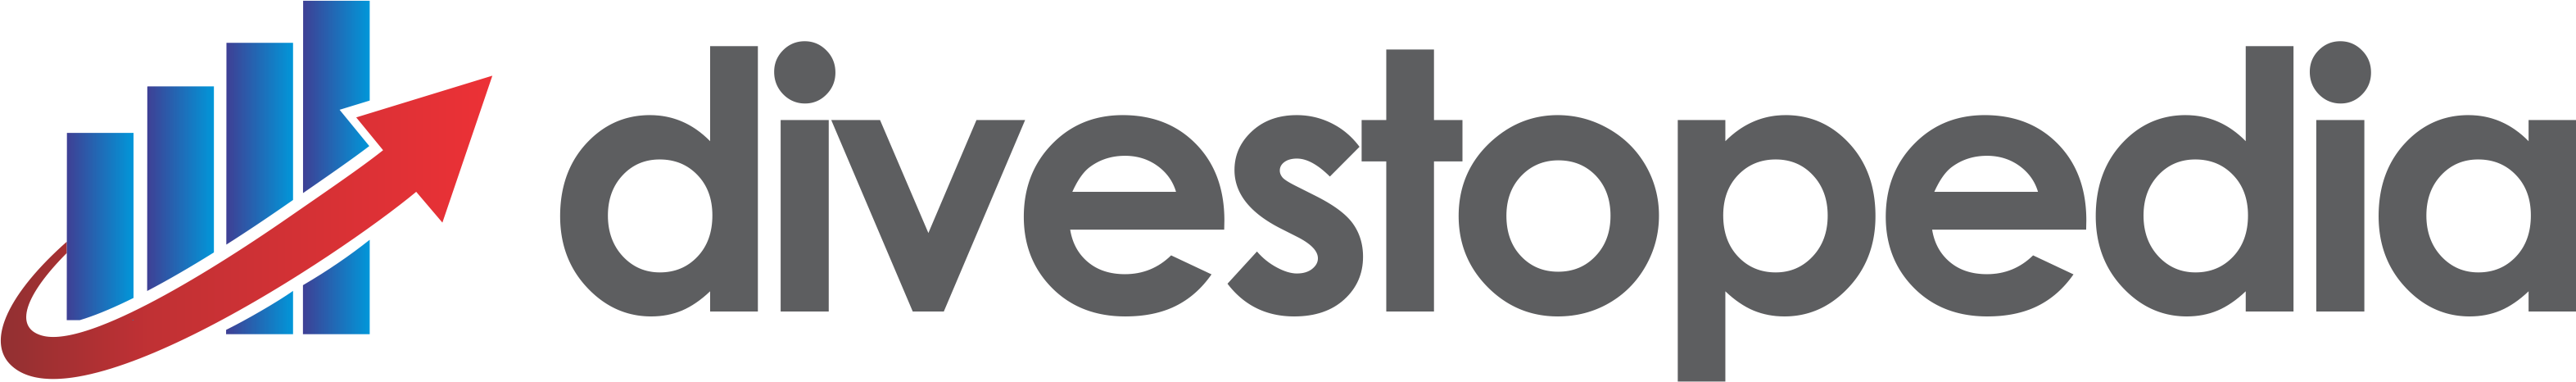 Divestopedia masterclass logo